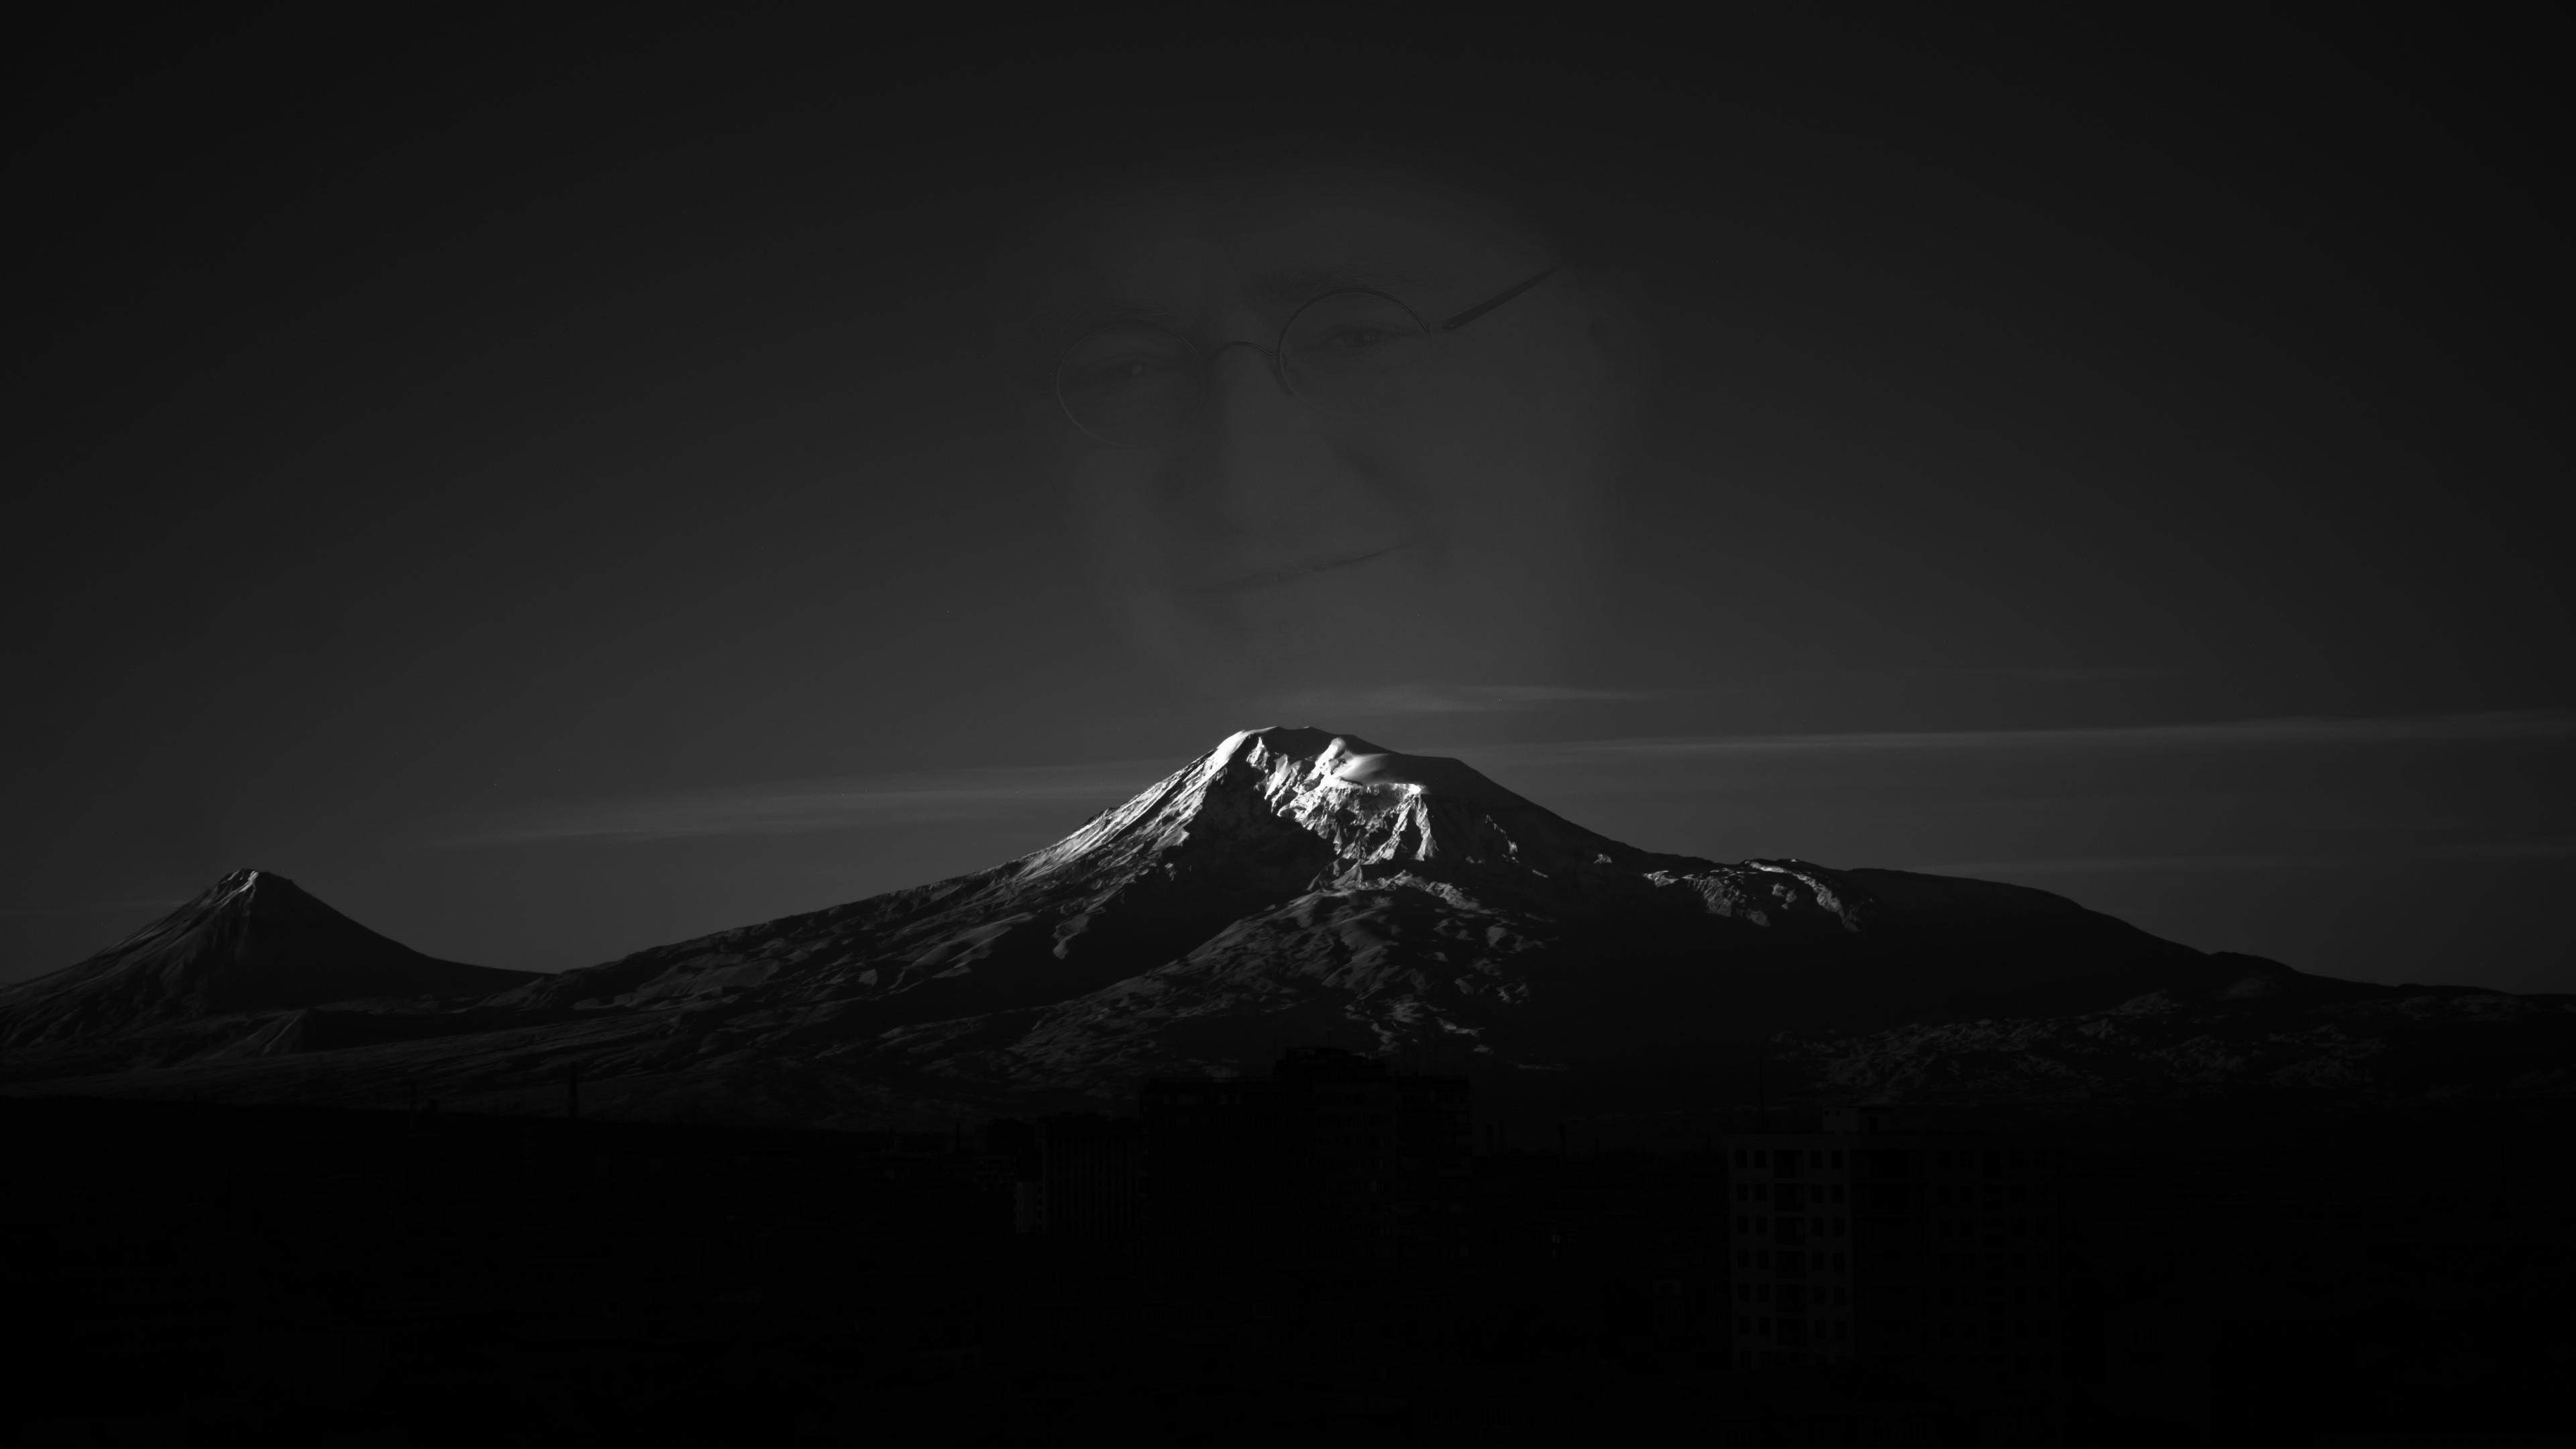 Gaben in the Mountains Wallpaper